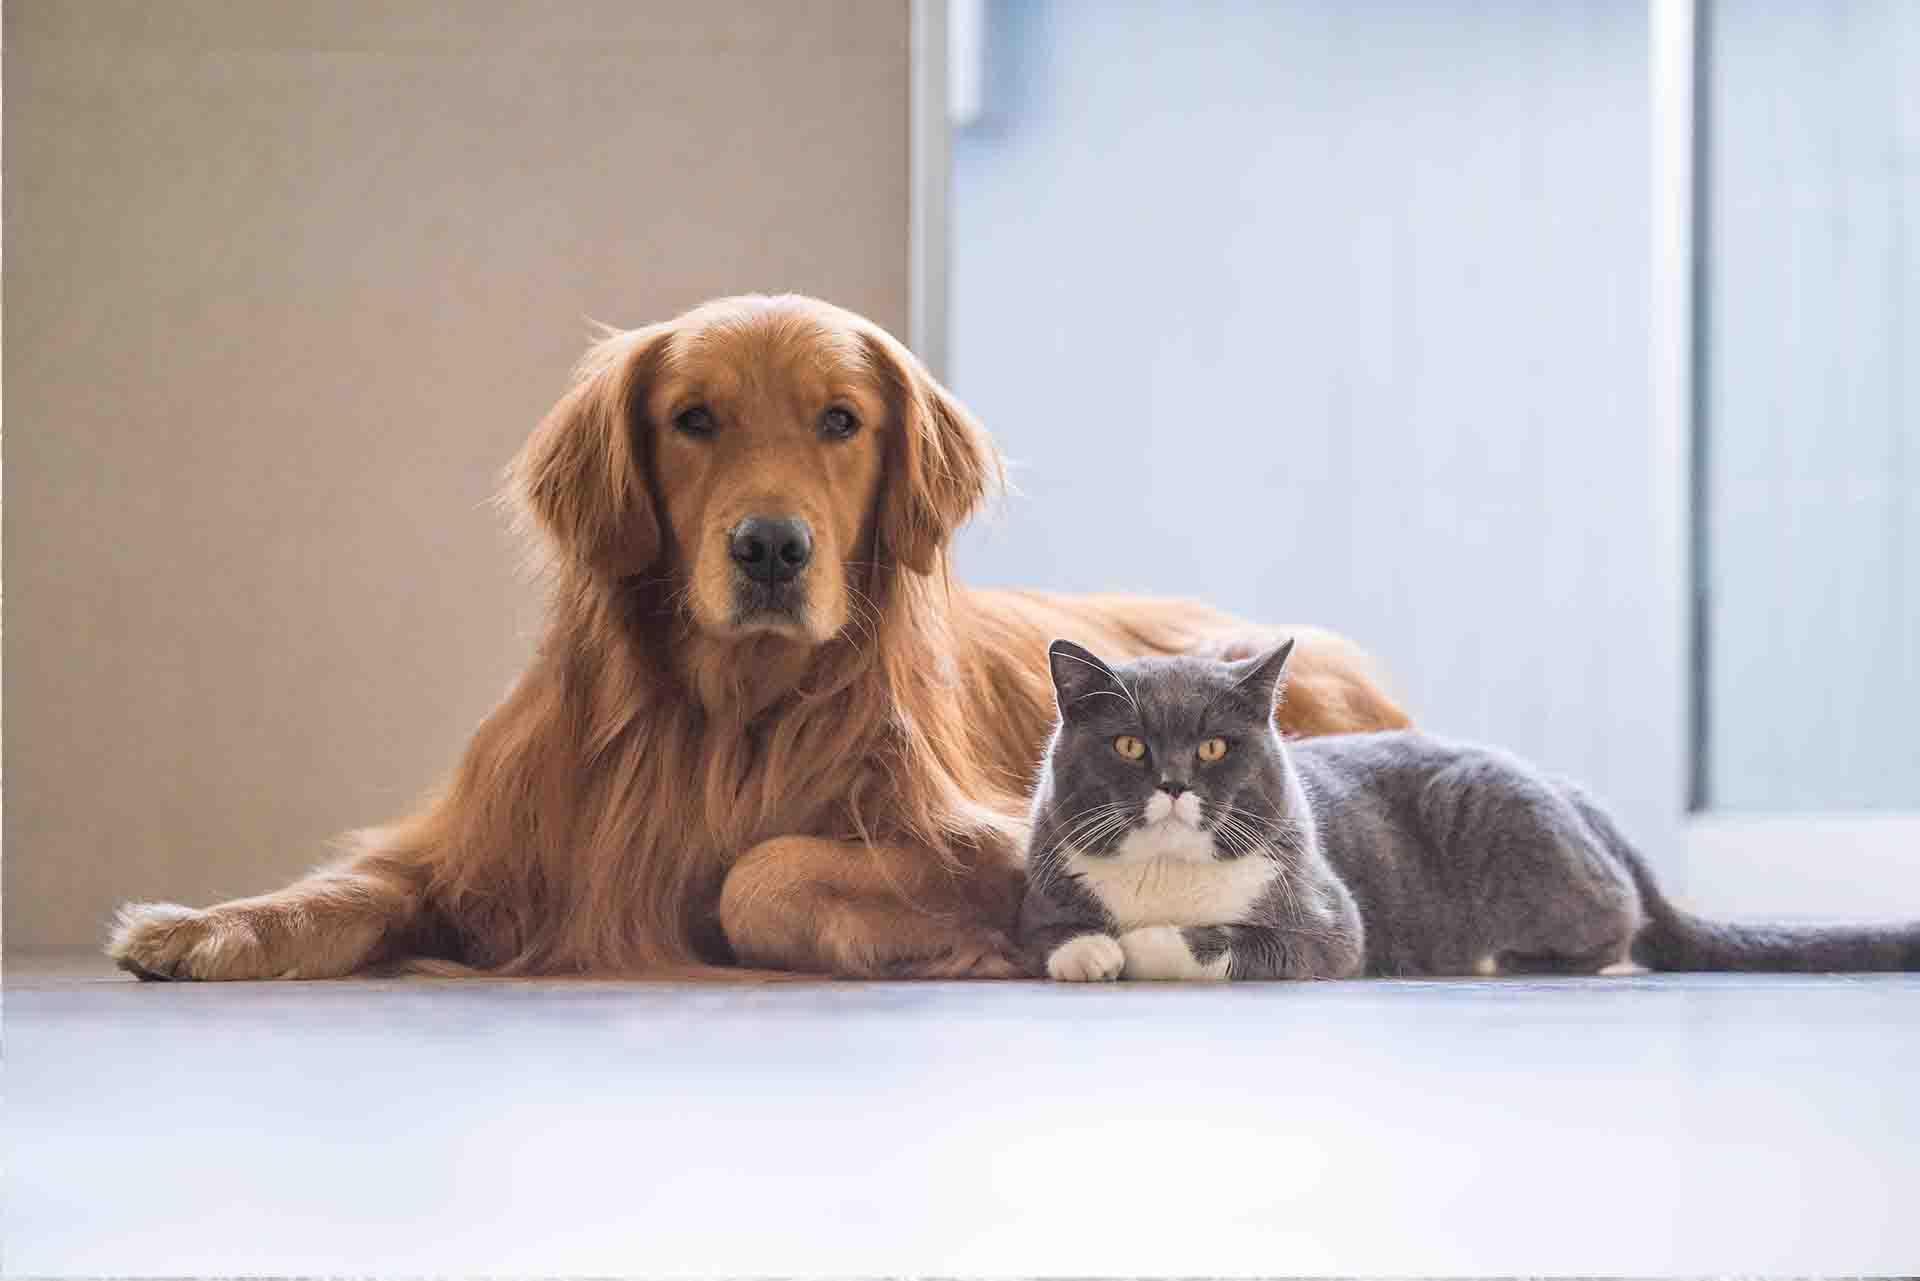 Vet Services for Pets